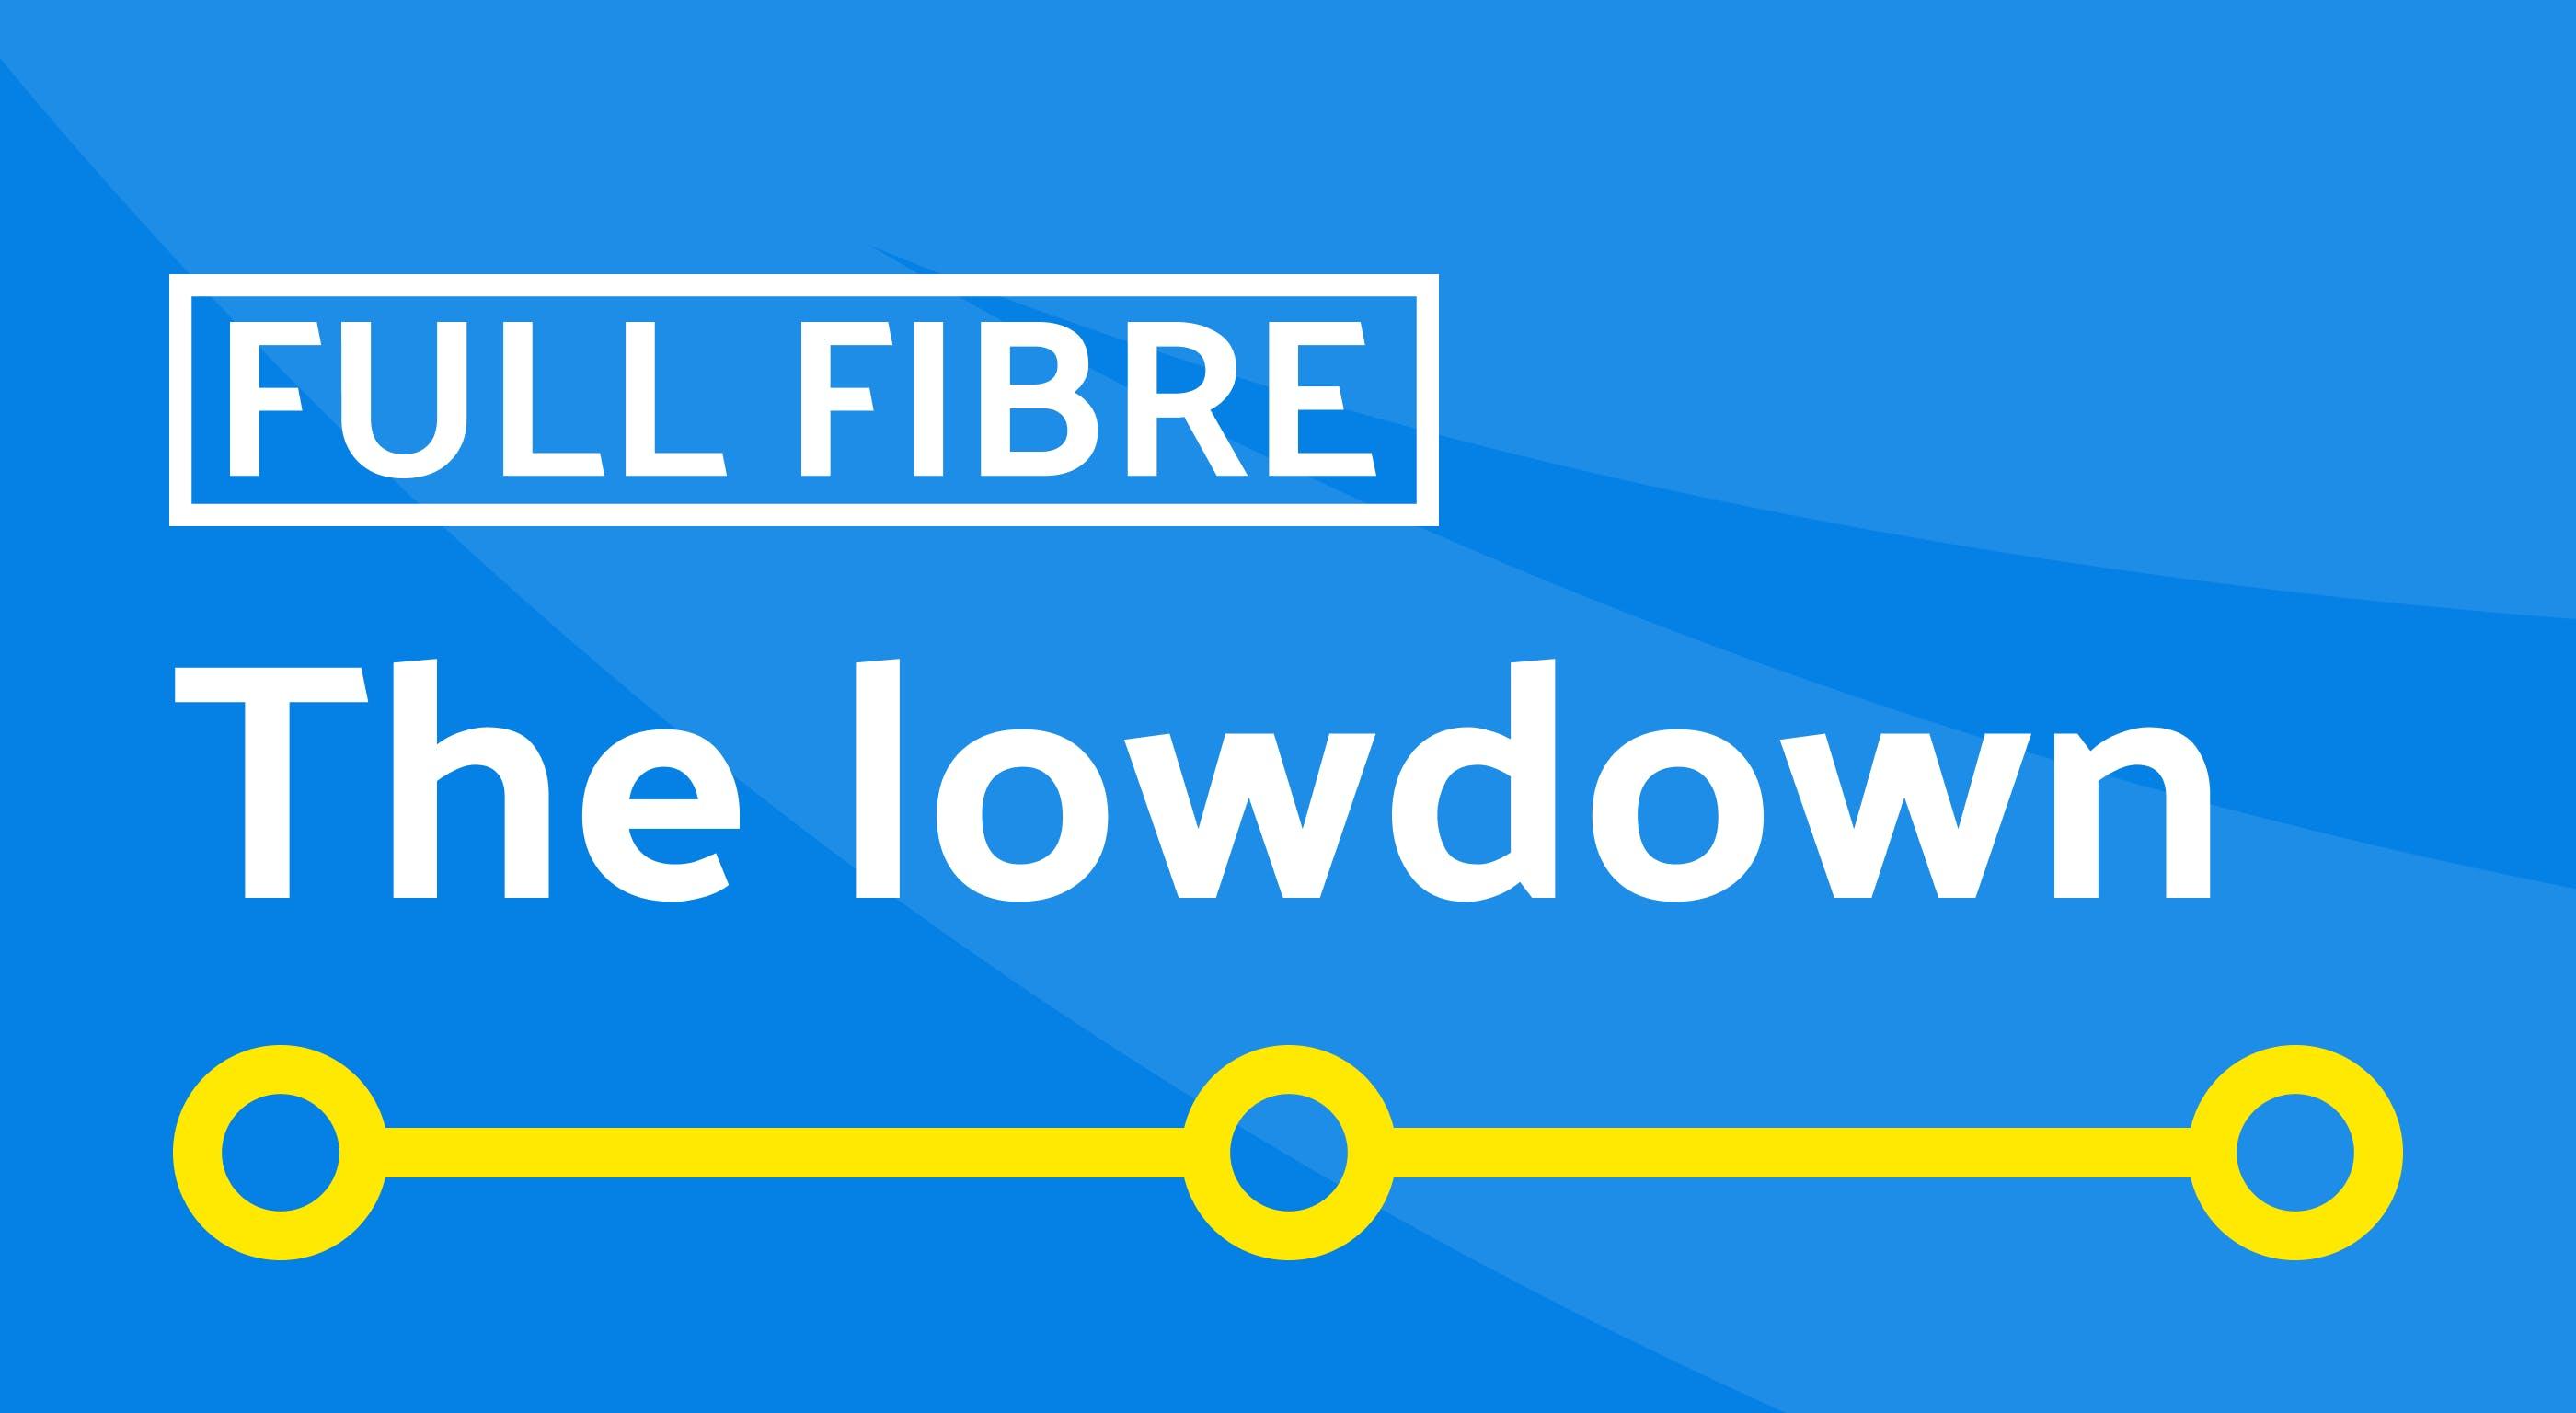 Full fibre - the lowdown